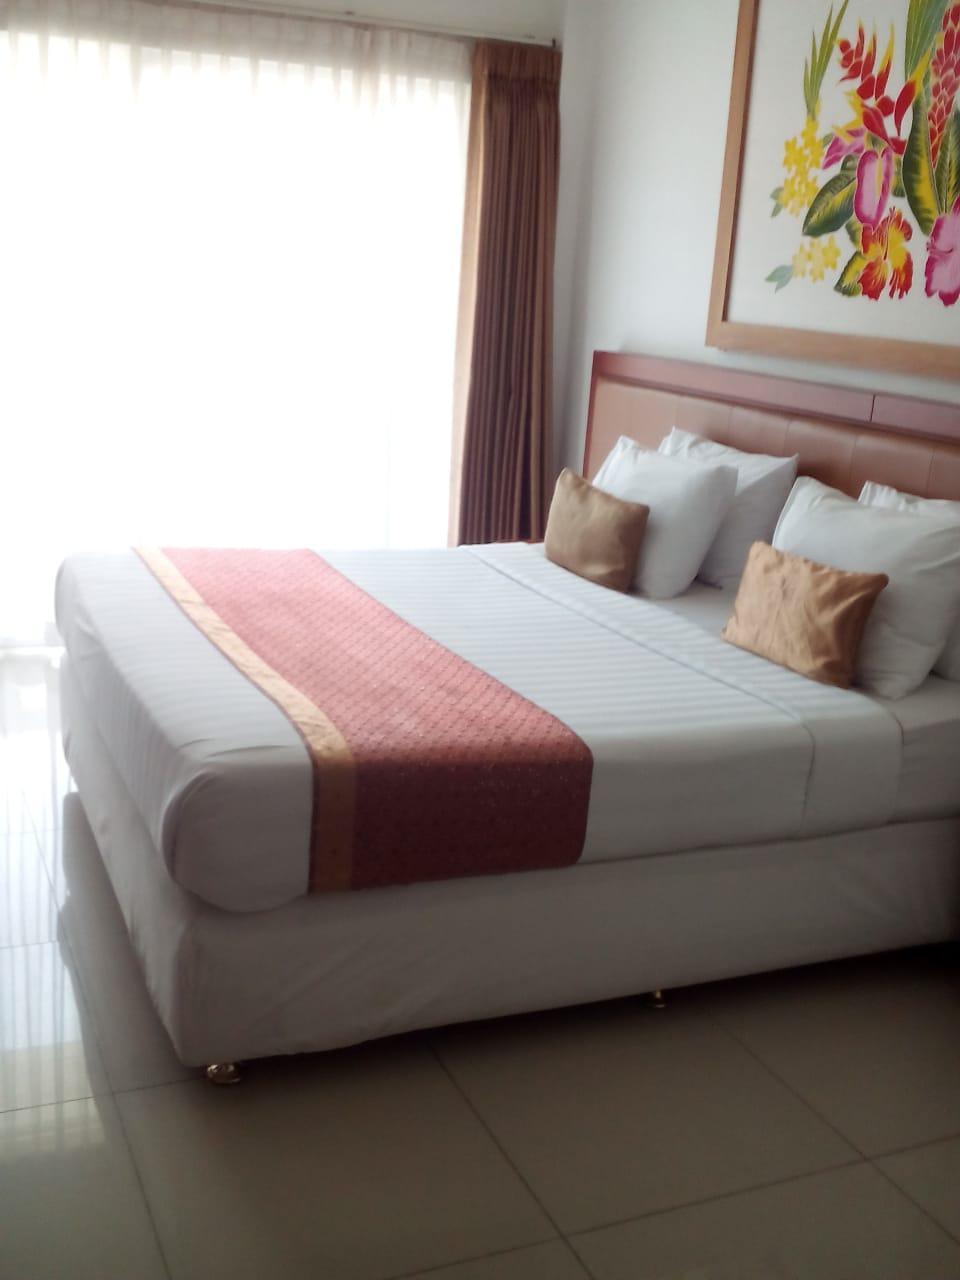 Grand Paradise Lembang : grand, paradise, lembang, Grand, Paradise, Hotel, Lembang, Resort, (Bandung), Deals,, Photos, Reviews